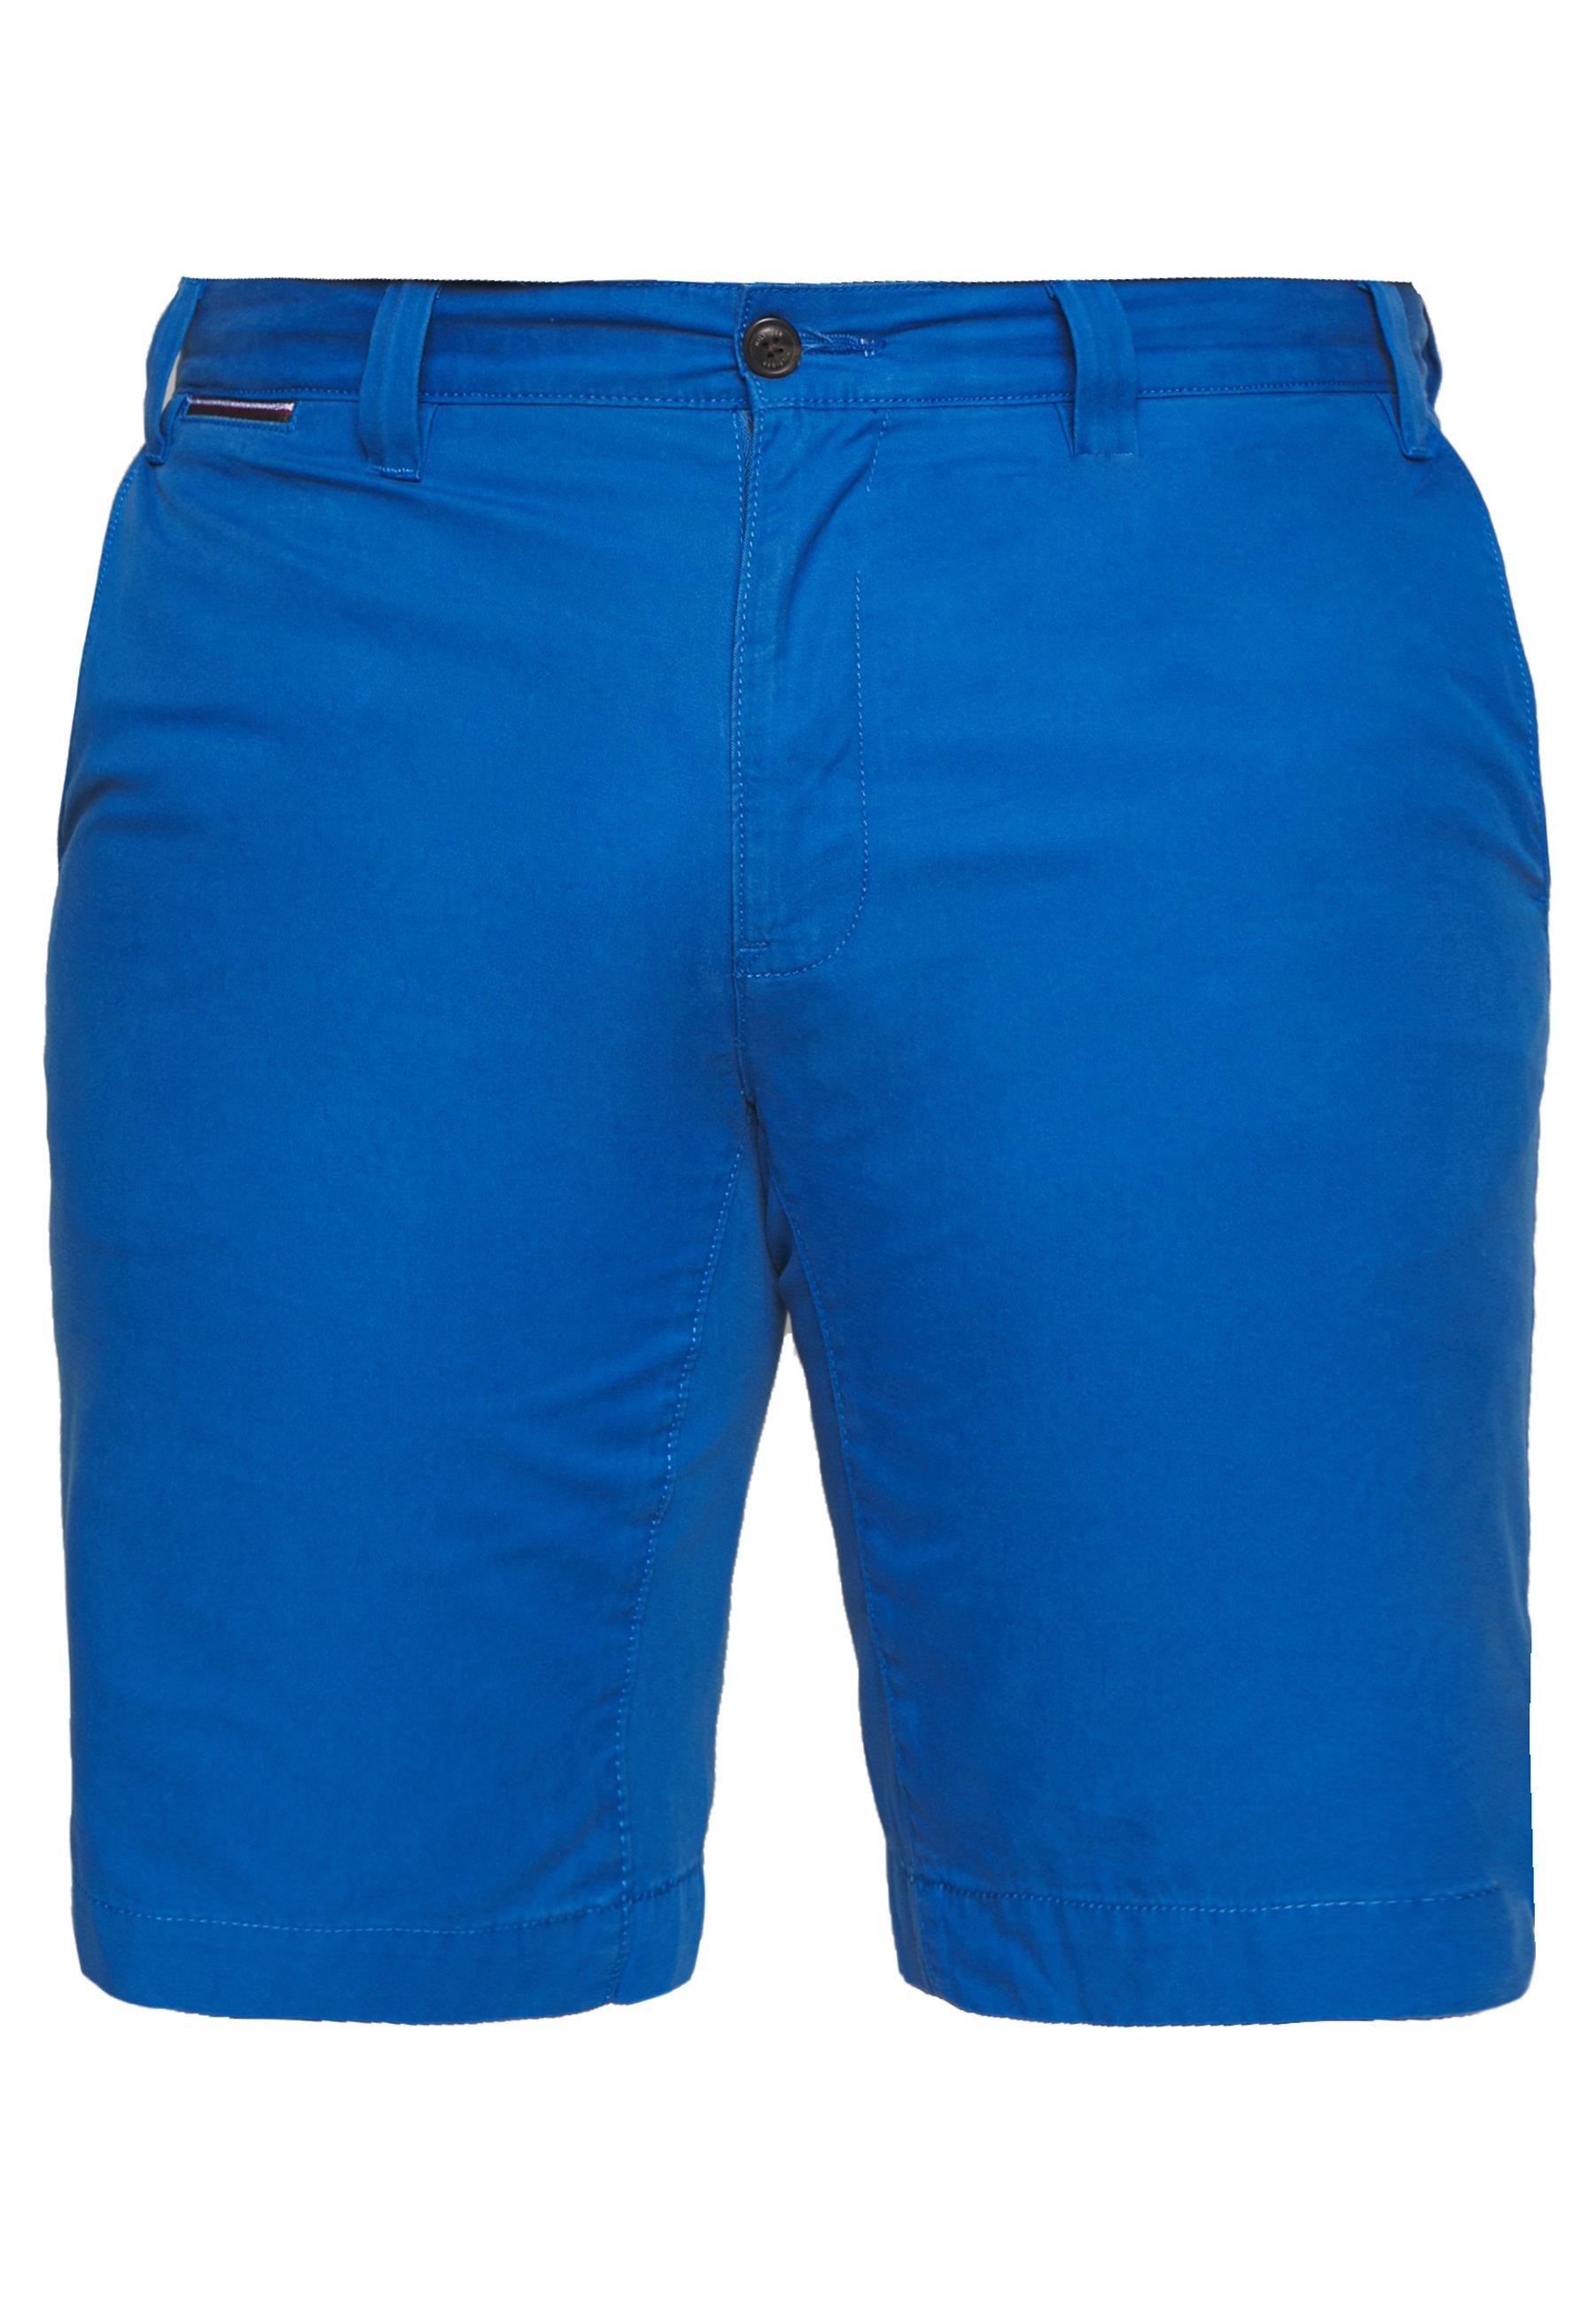 Tommy Hilfiger Brooklyn Light - Shorts Blue